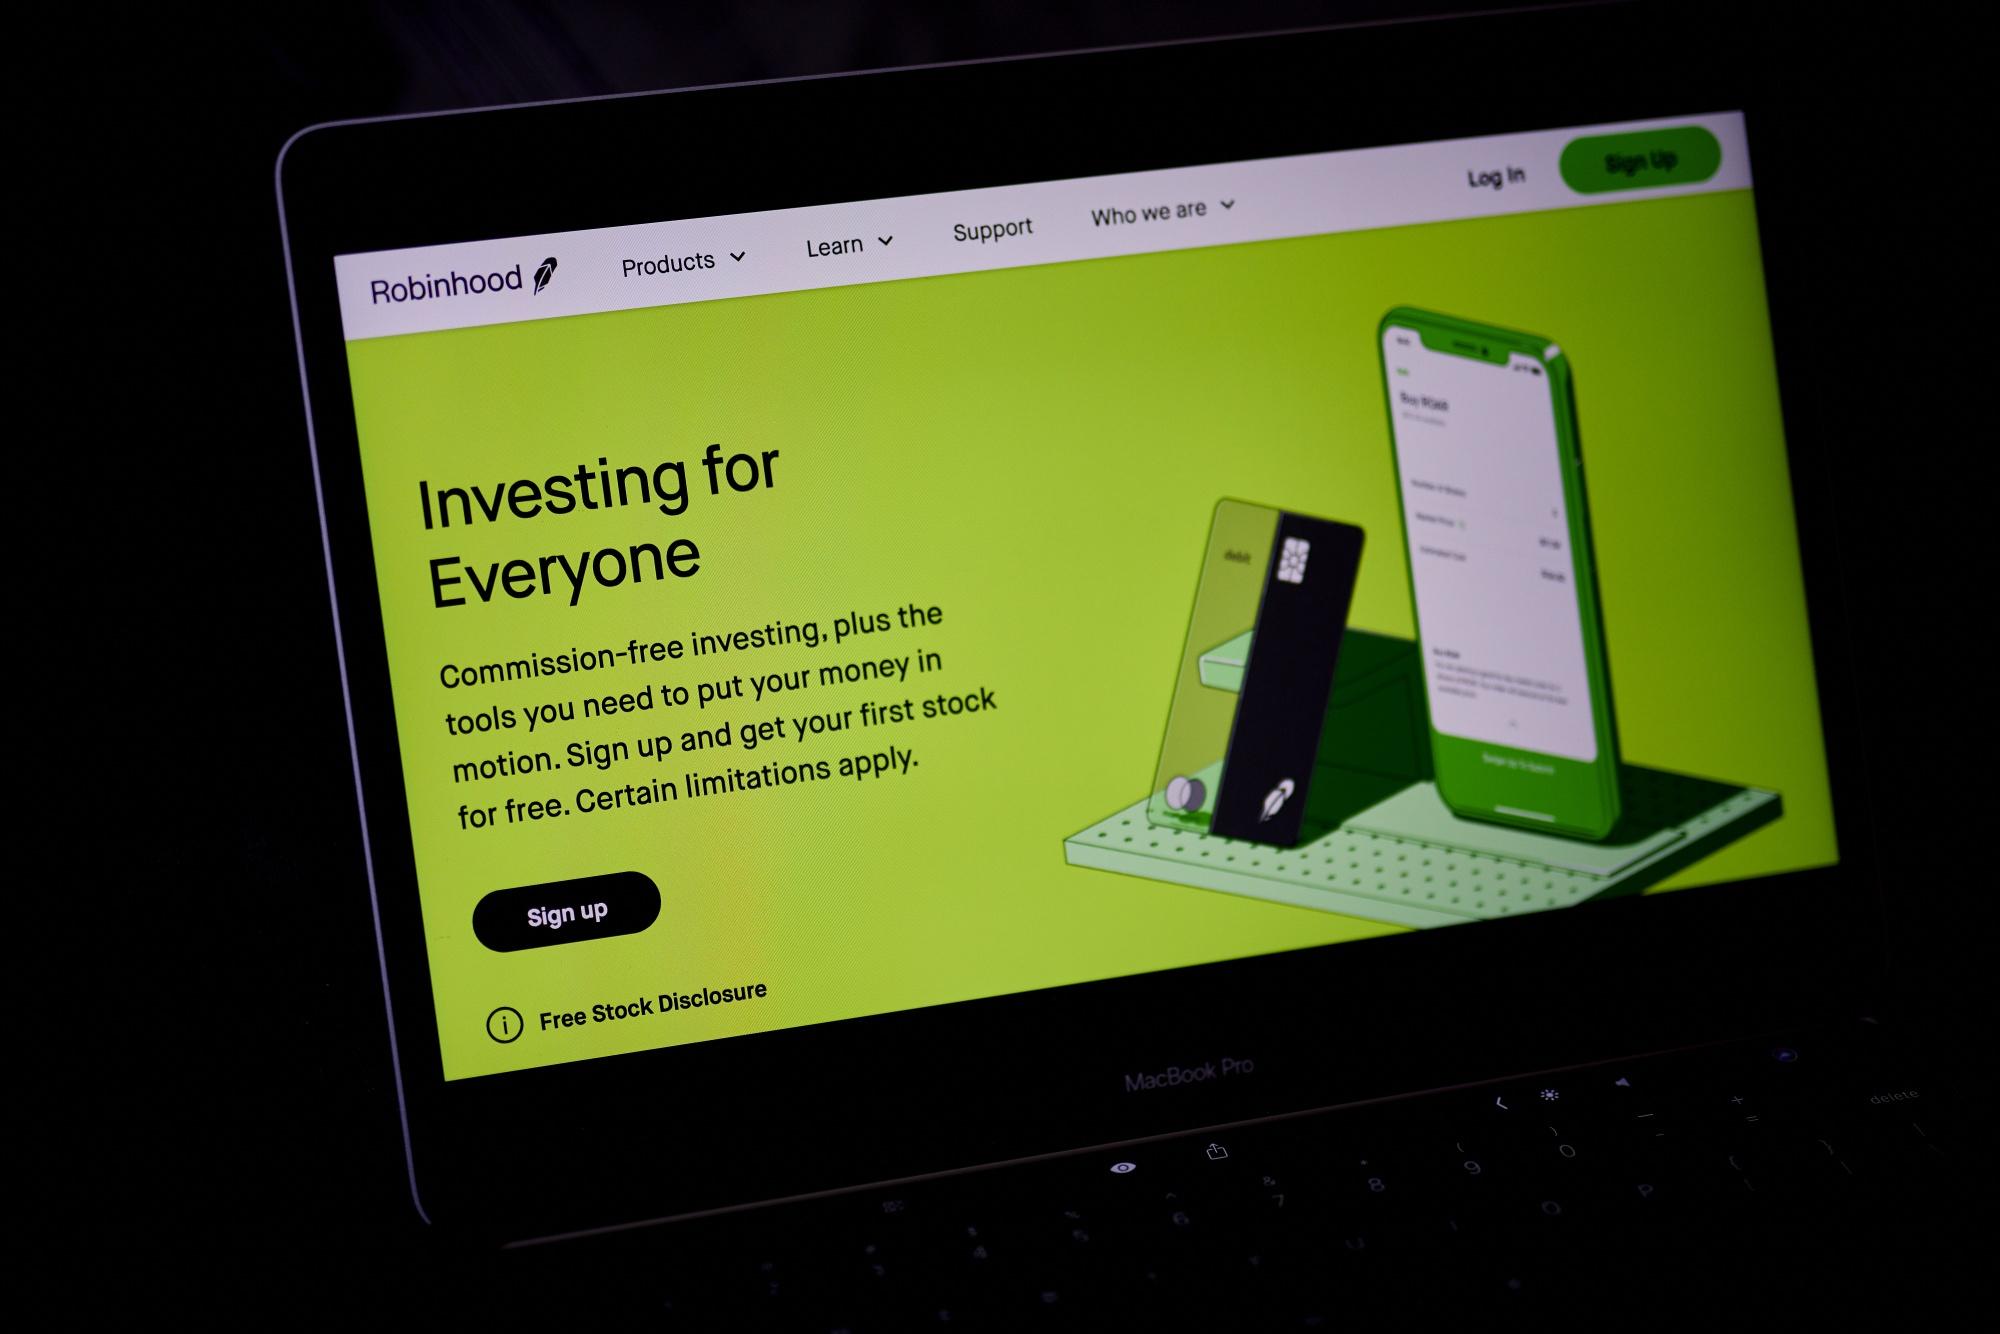 Robinhood Website Home Screen